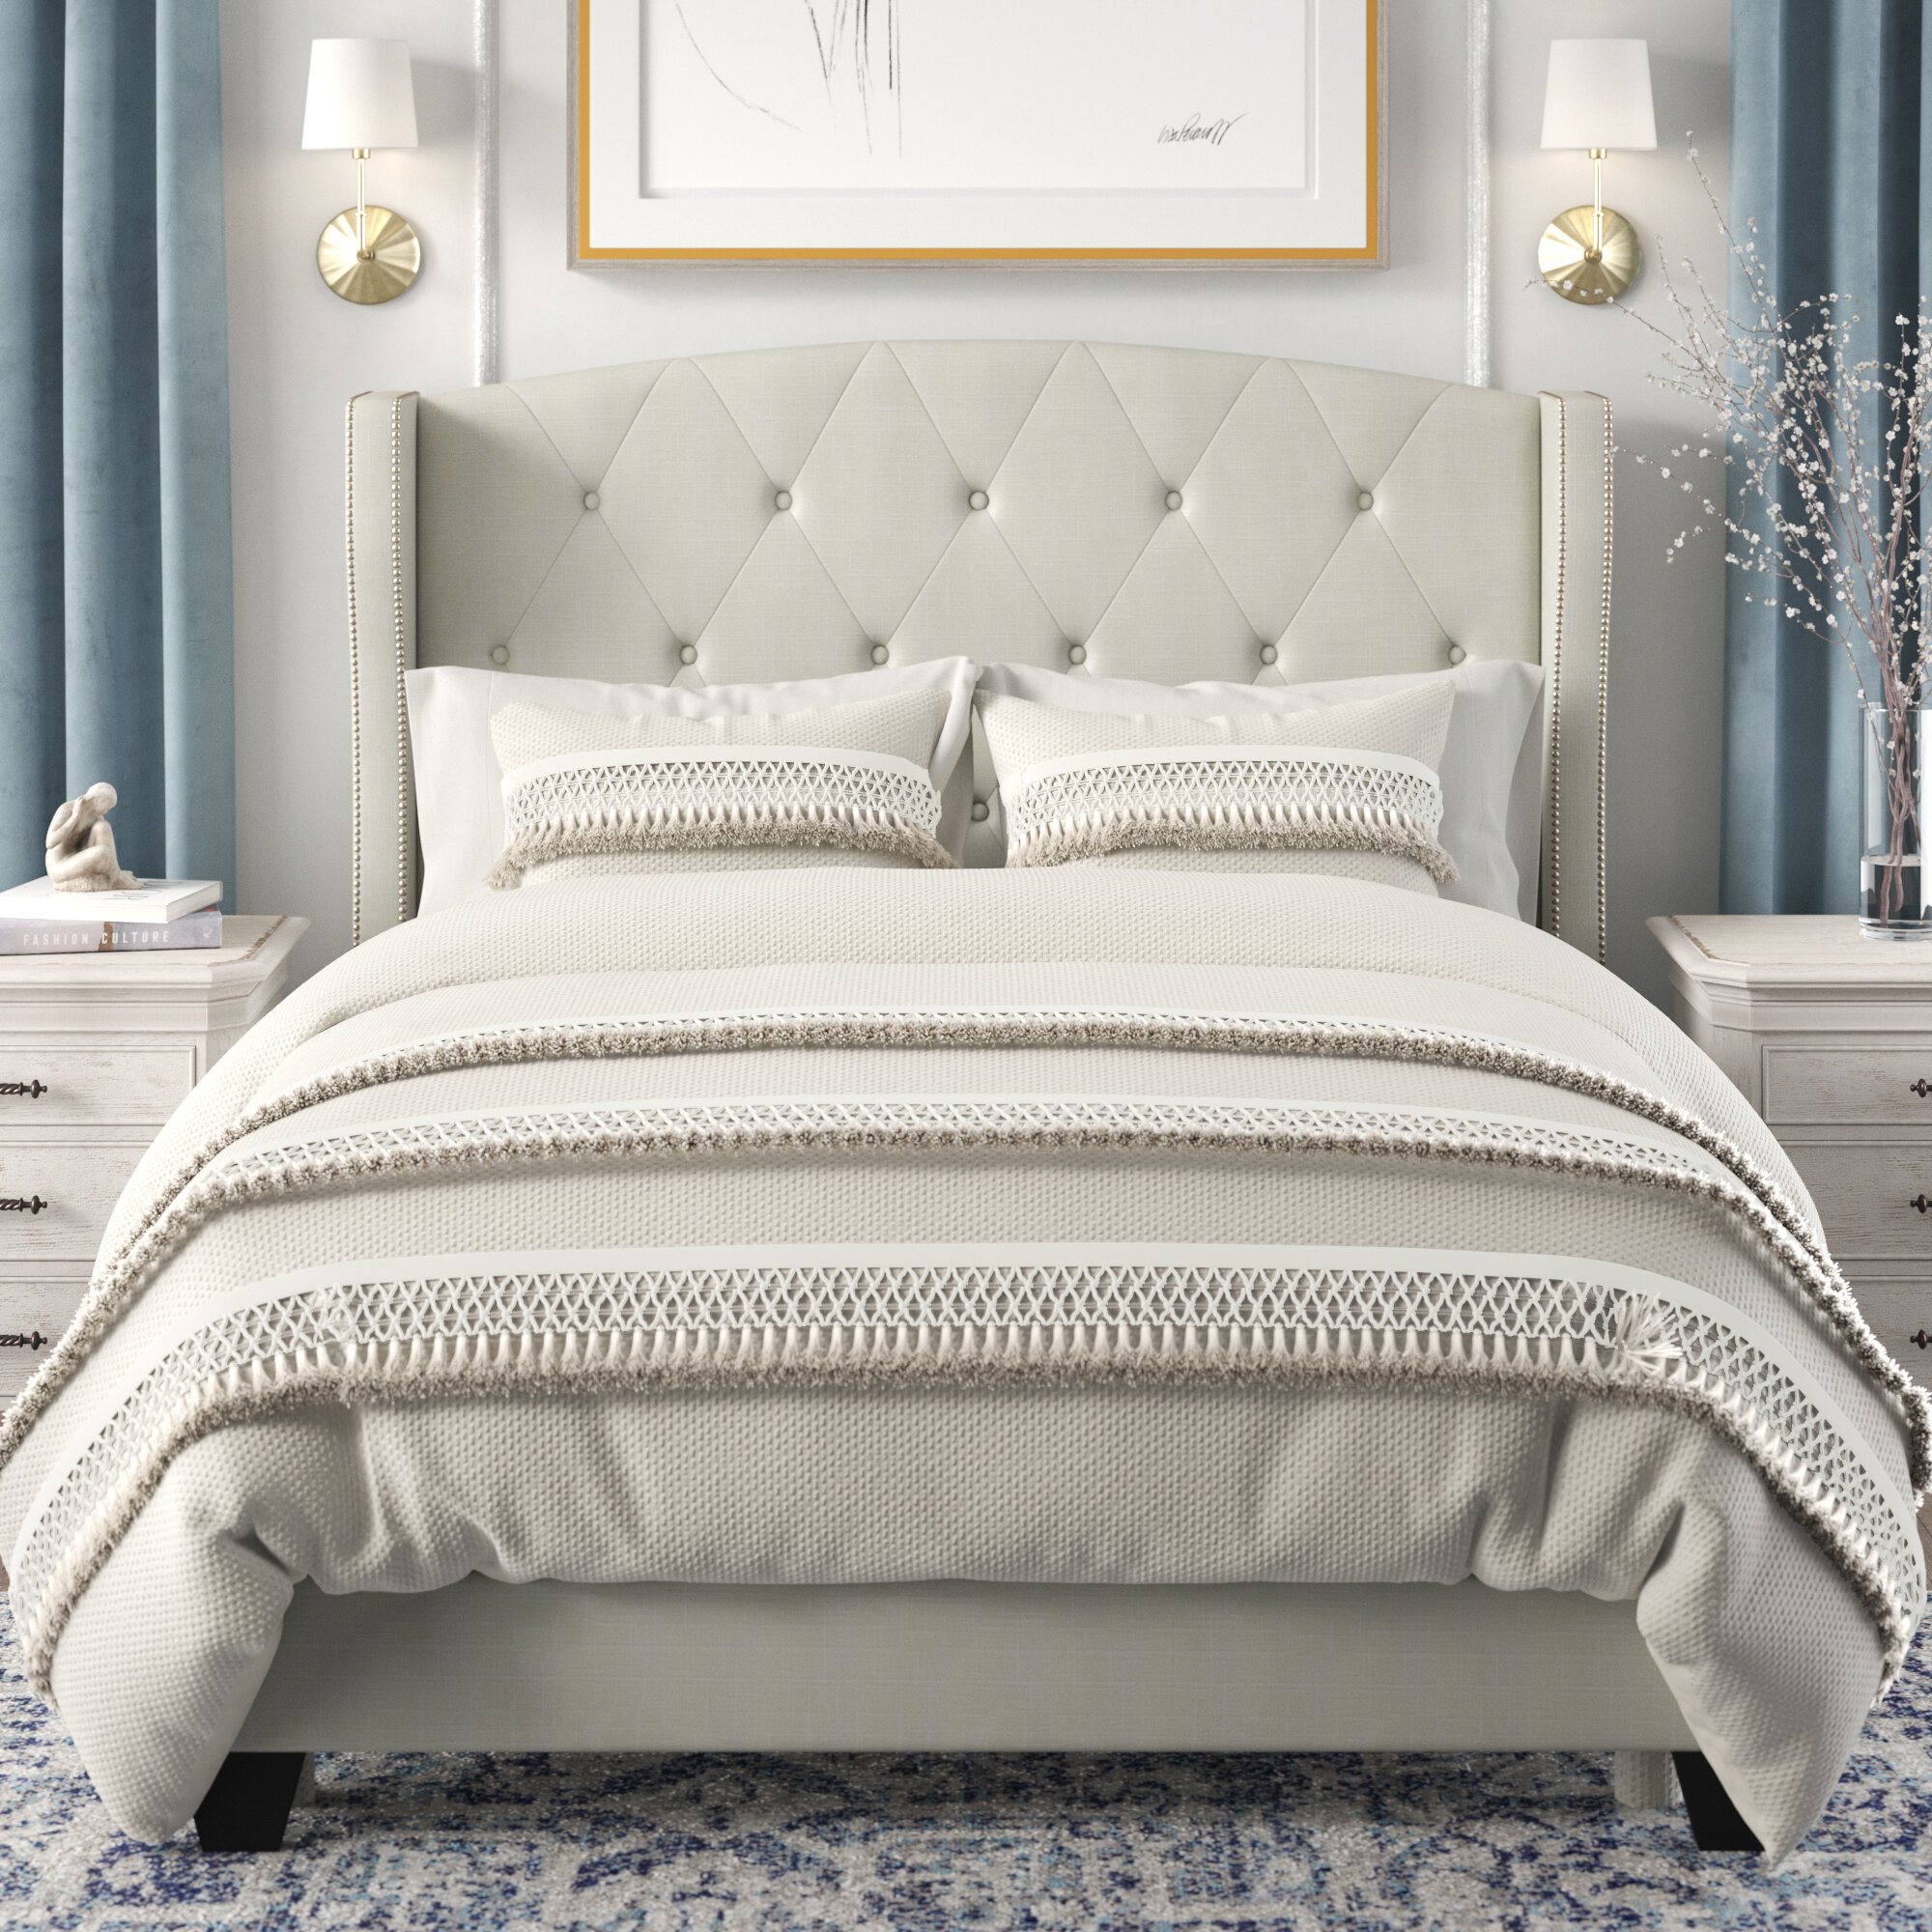 Kelly Clarkson Home Mccrory Cotton Seersucker Reversible Comforter Set Reviews Wayfair